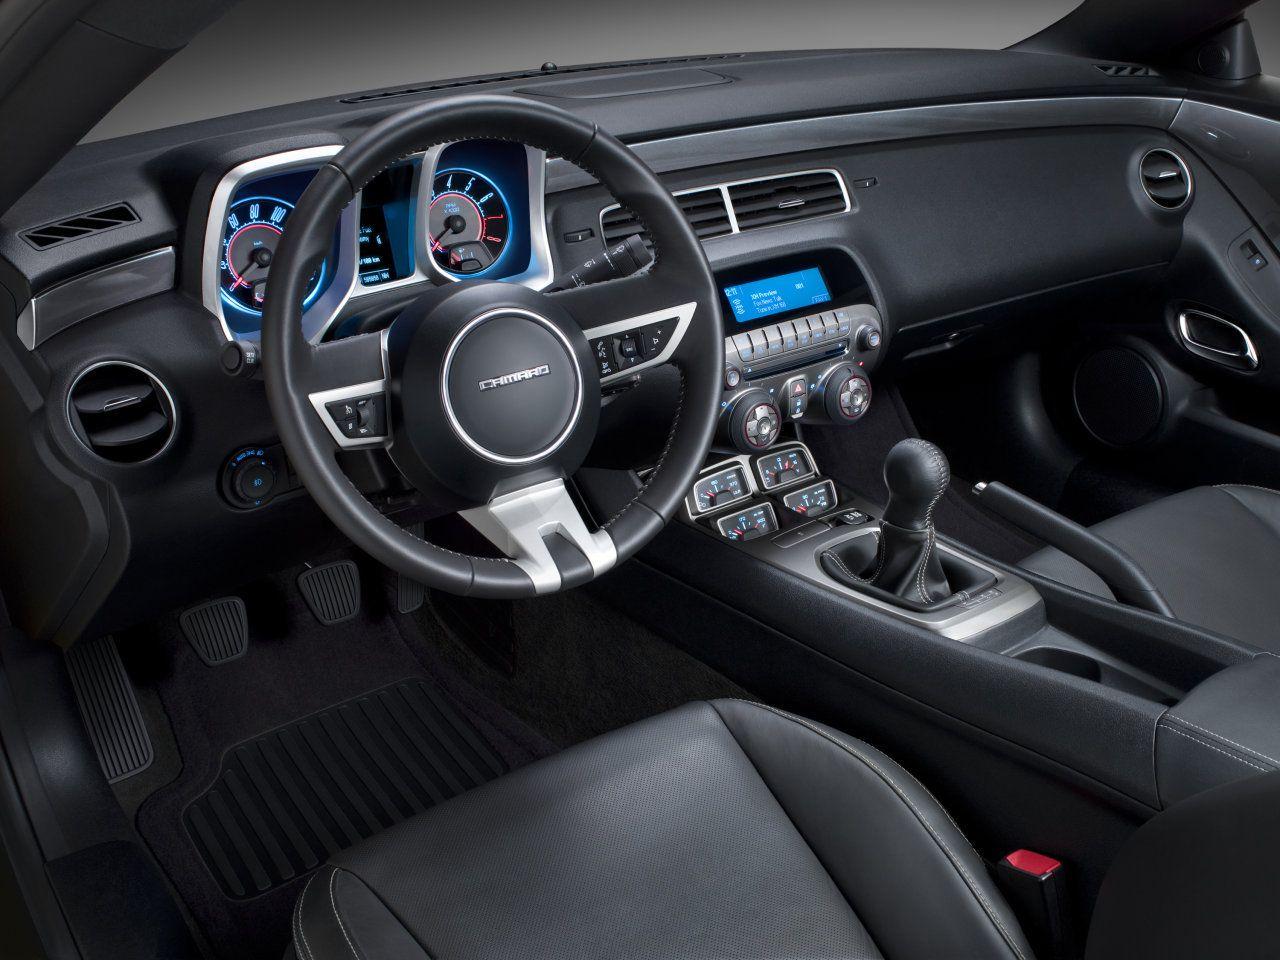 2010 Chevrolet Camaro Coupe Photo Gallery Camaro Interior